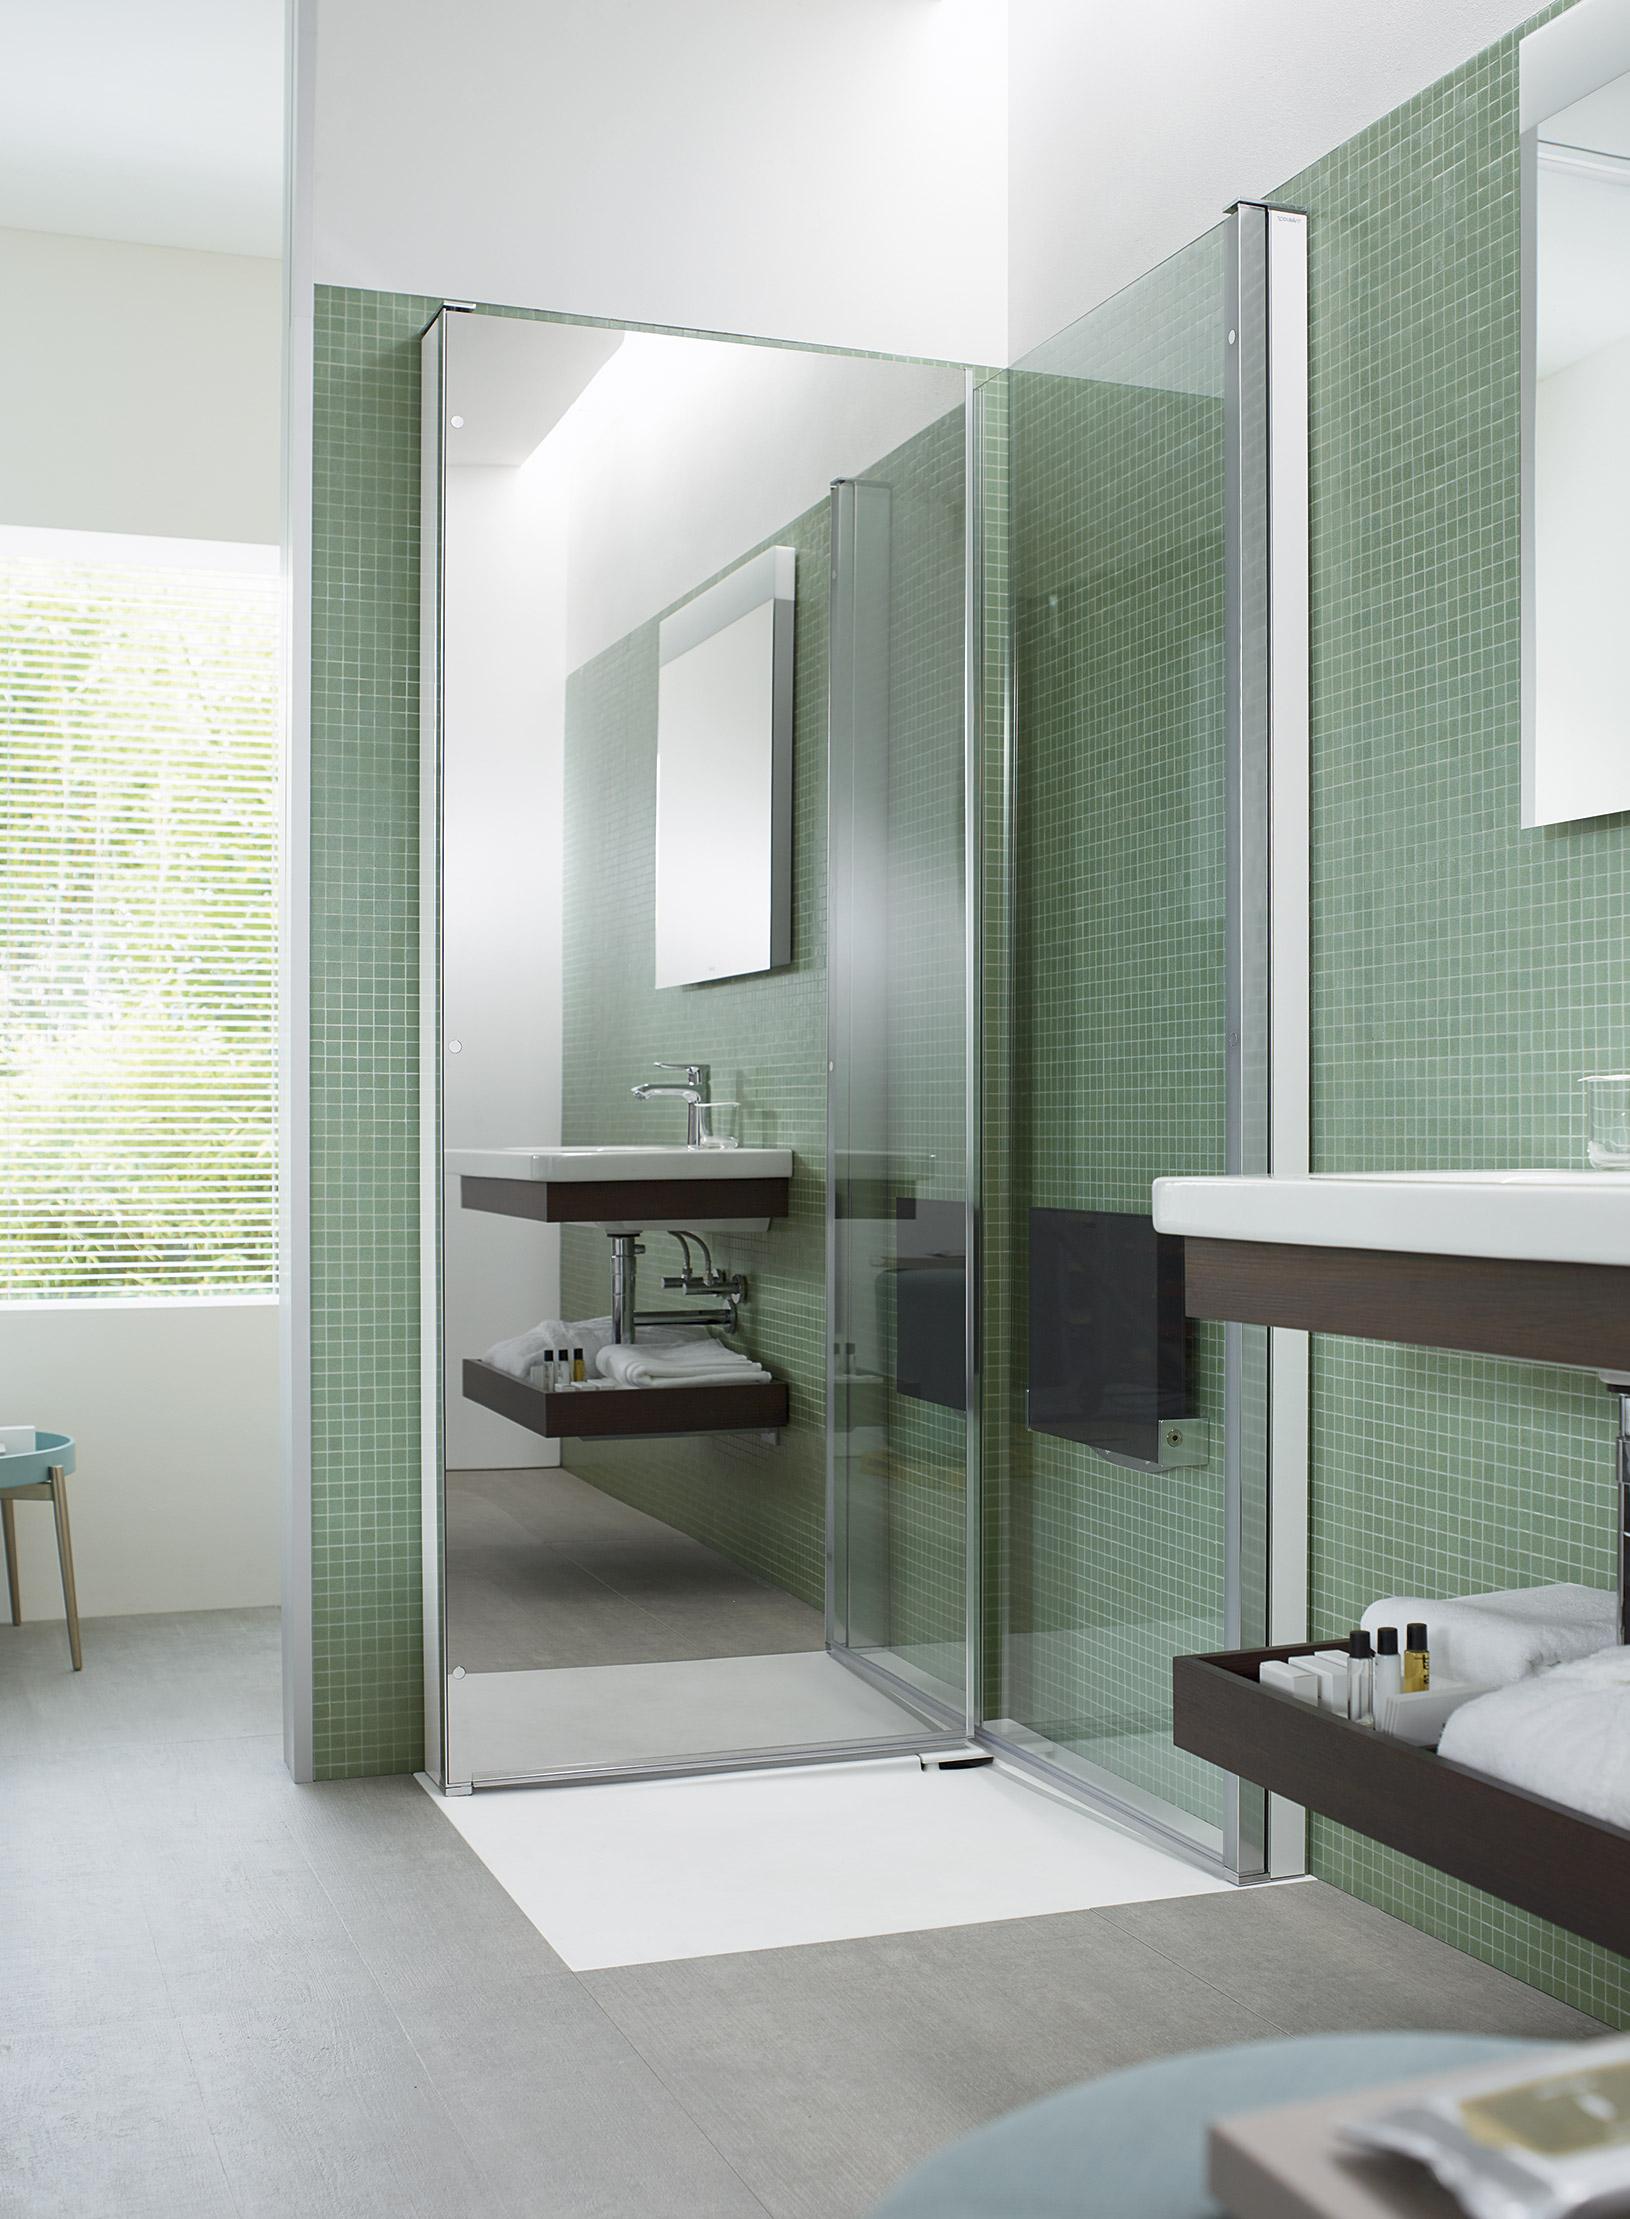 Duravit P3 Comforts Washbasins Toilets Bathtubs Amp More